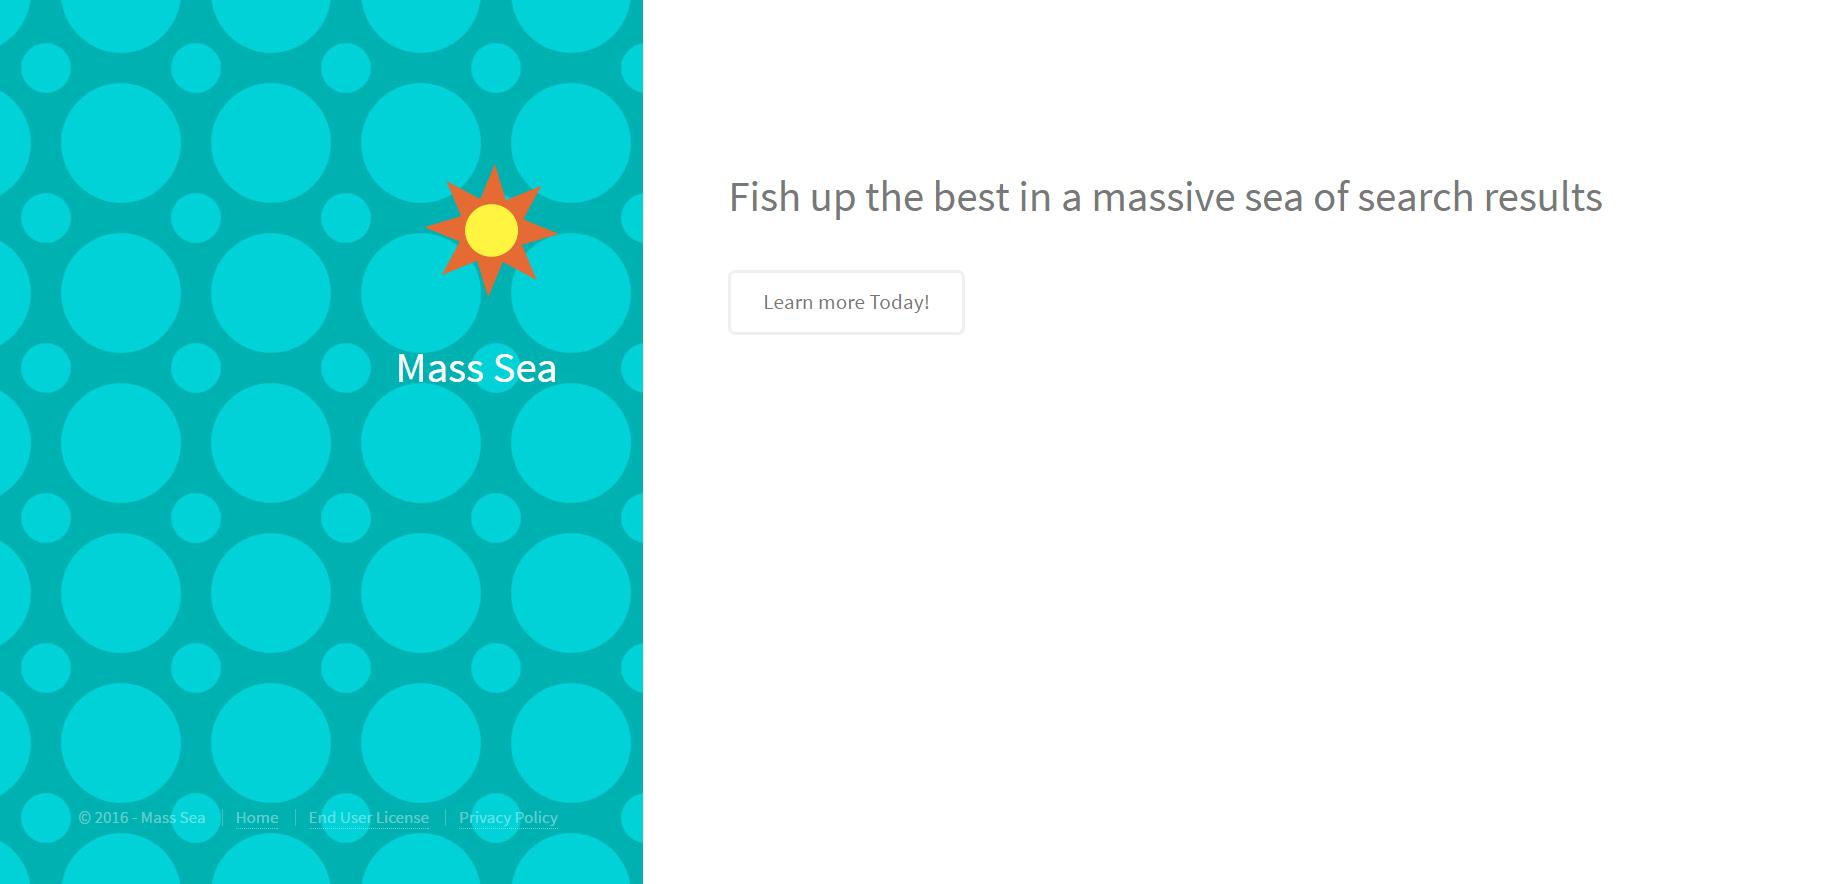 Mass Sea Ads